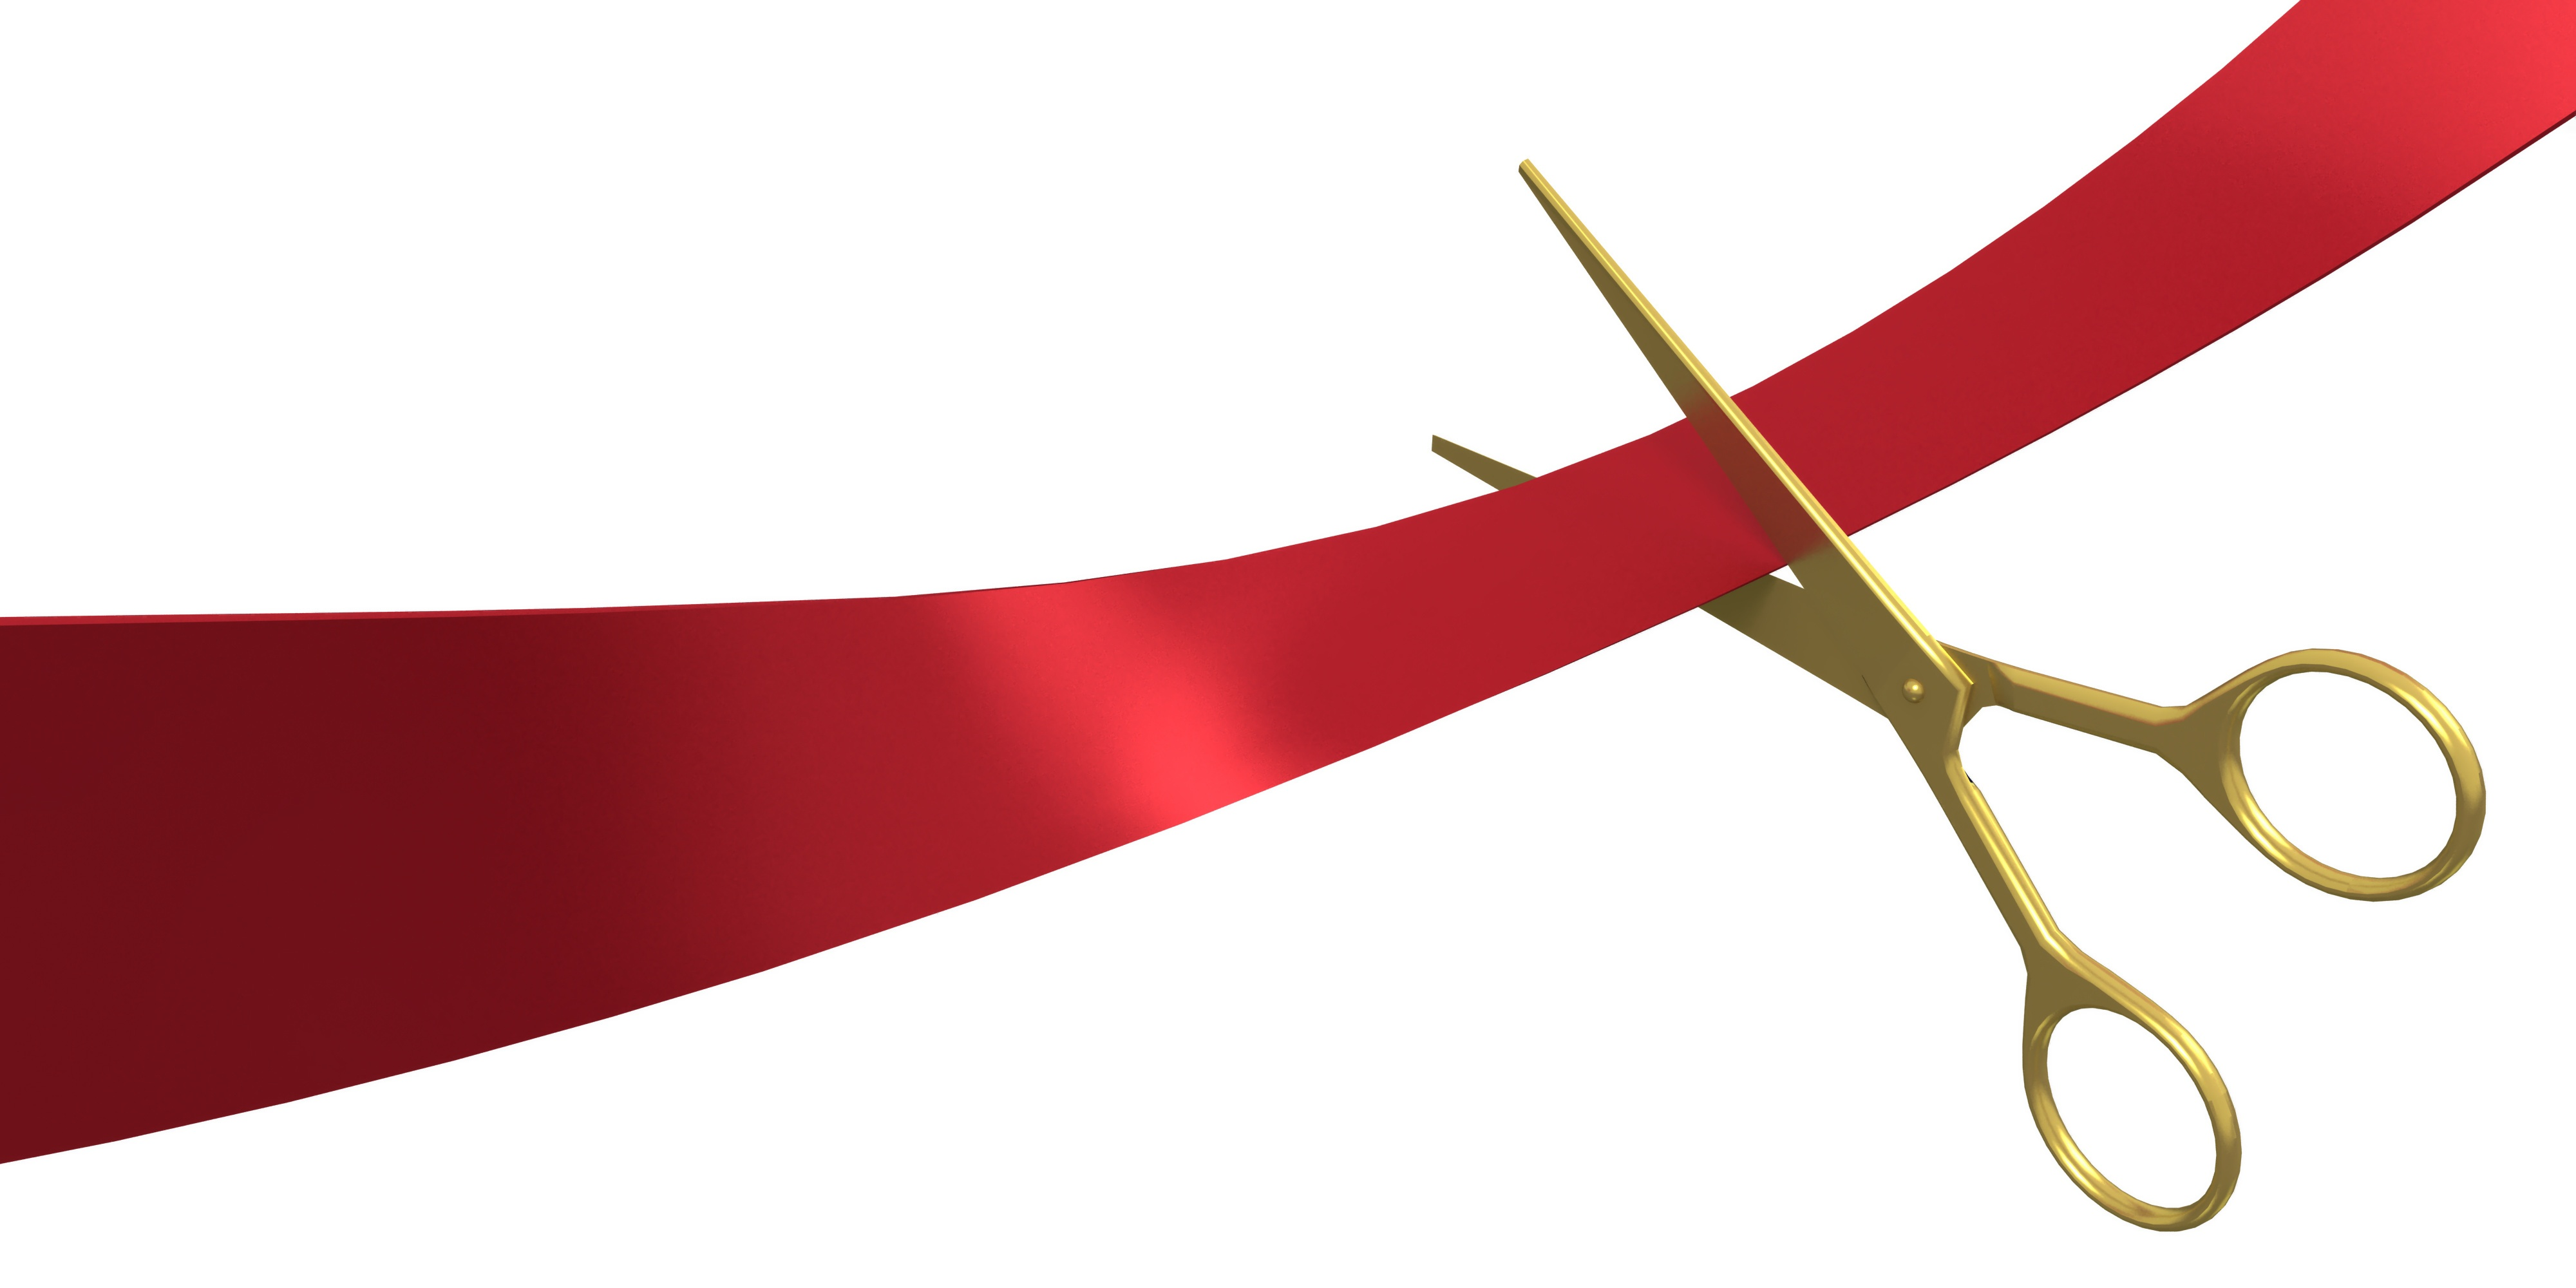 Ribbon Cutting AdobeStock_38854051.jpeg